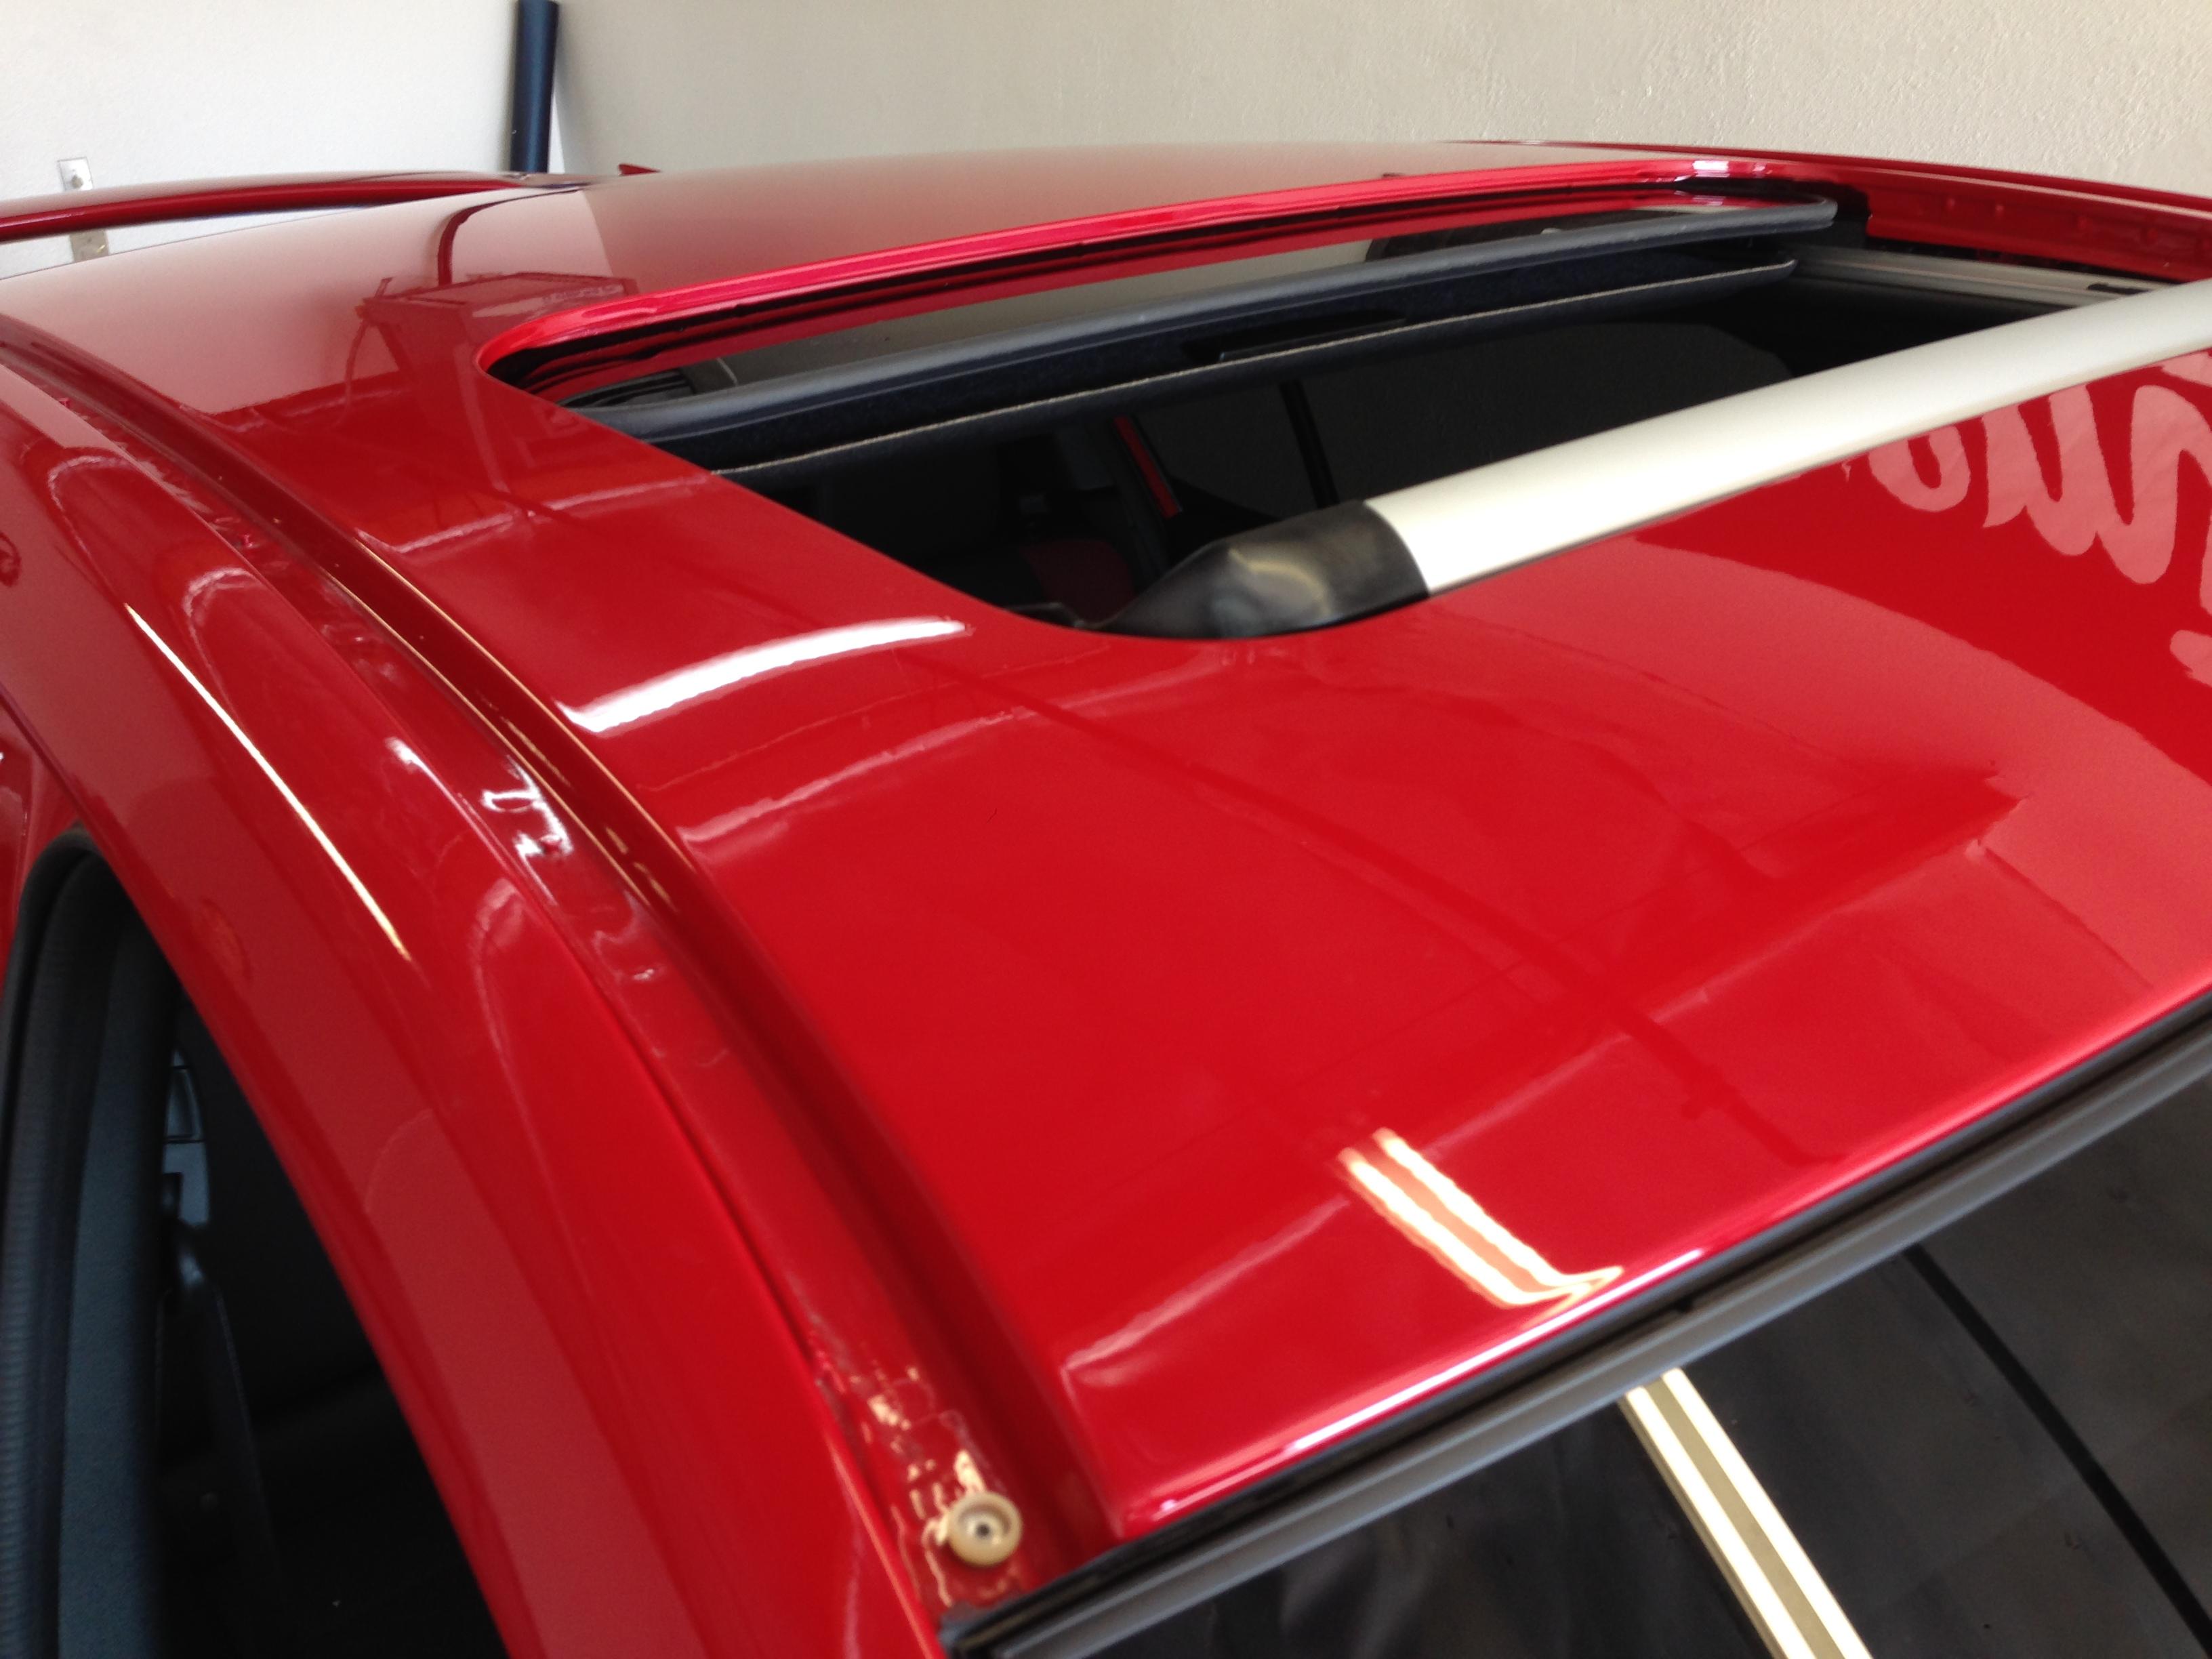 2015 Subaru Wrx Sti Vinyl Roof Wrap Premium Auto Styling